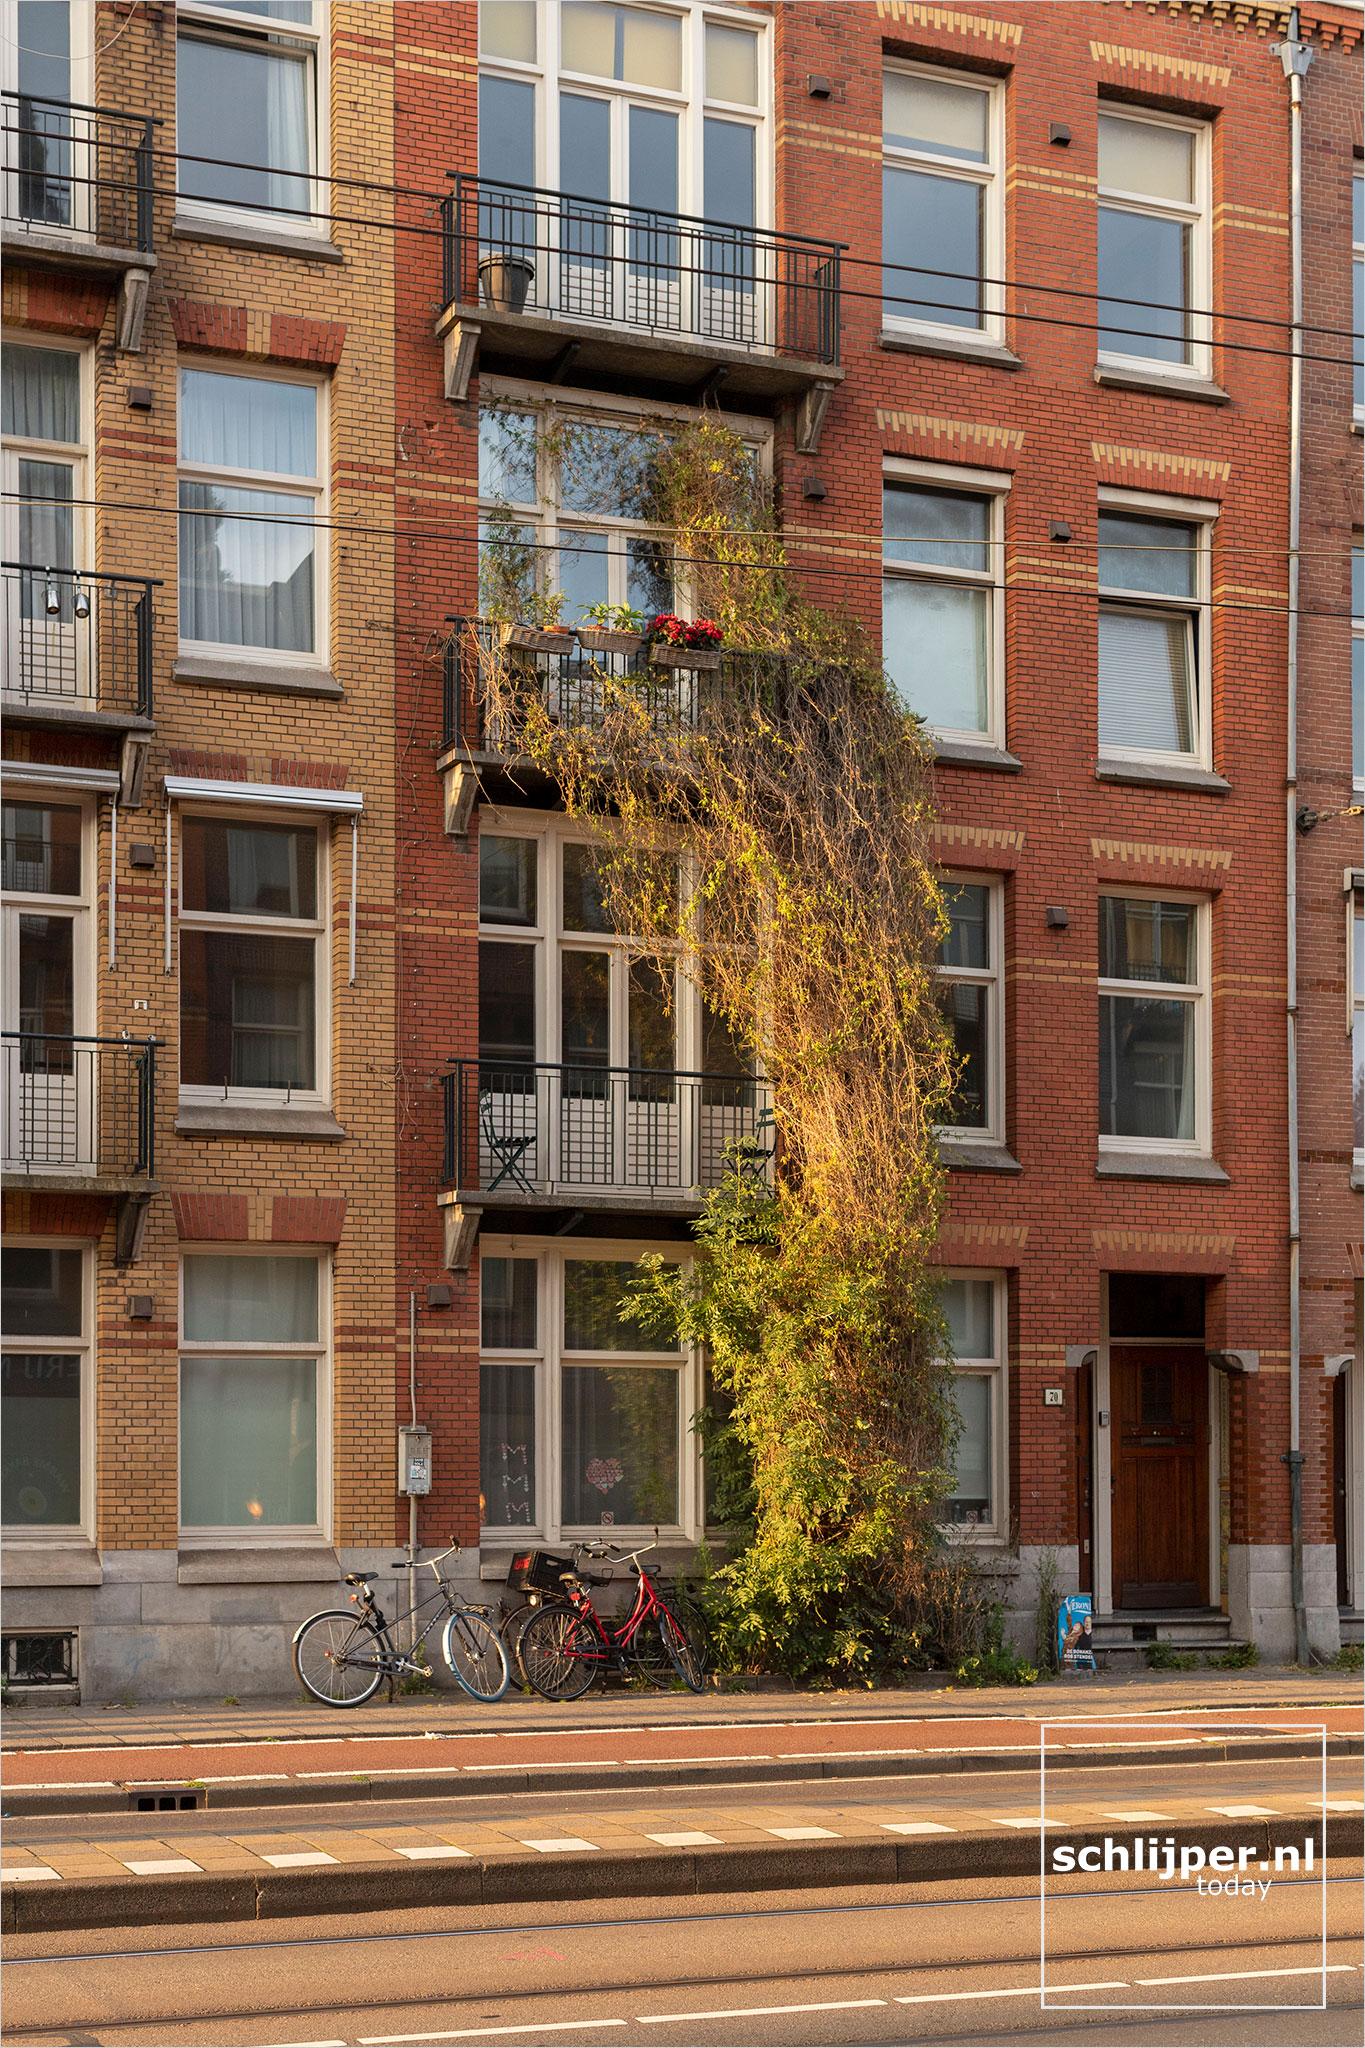 The Netherlands, Amsterdam, 3 augustus 2021